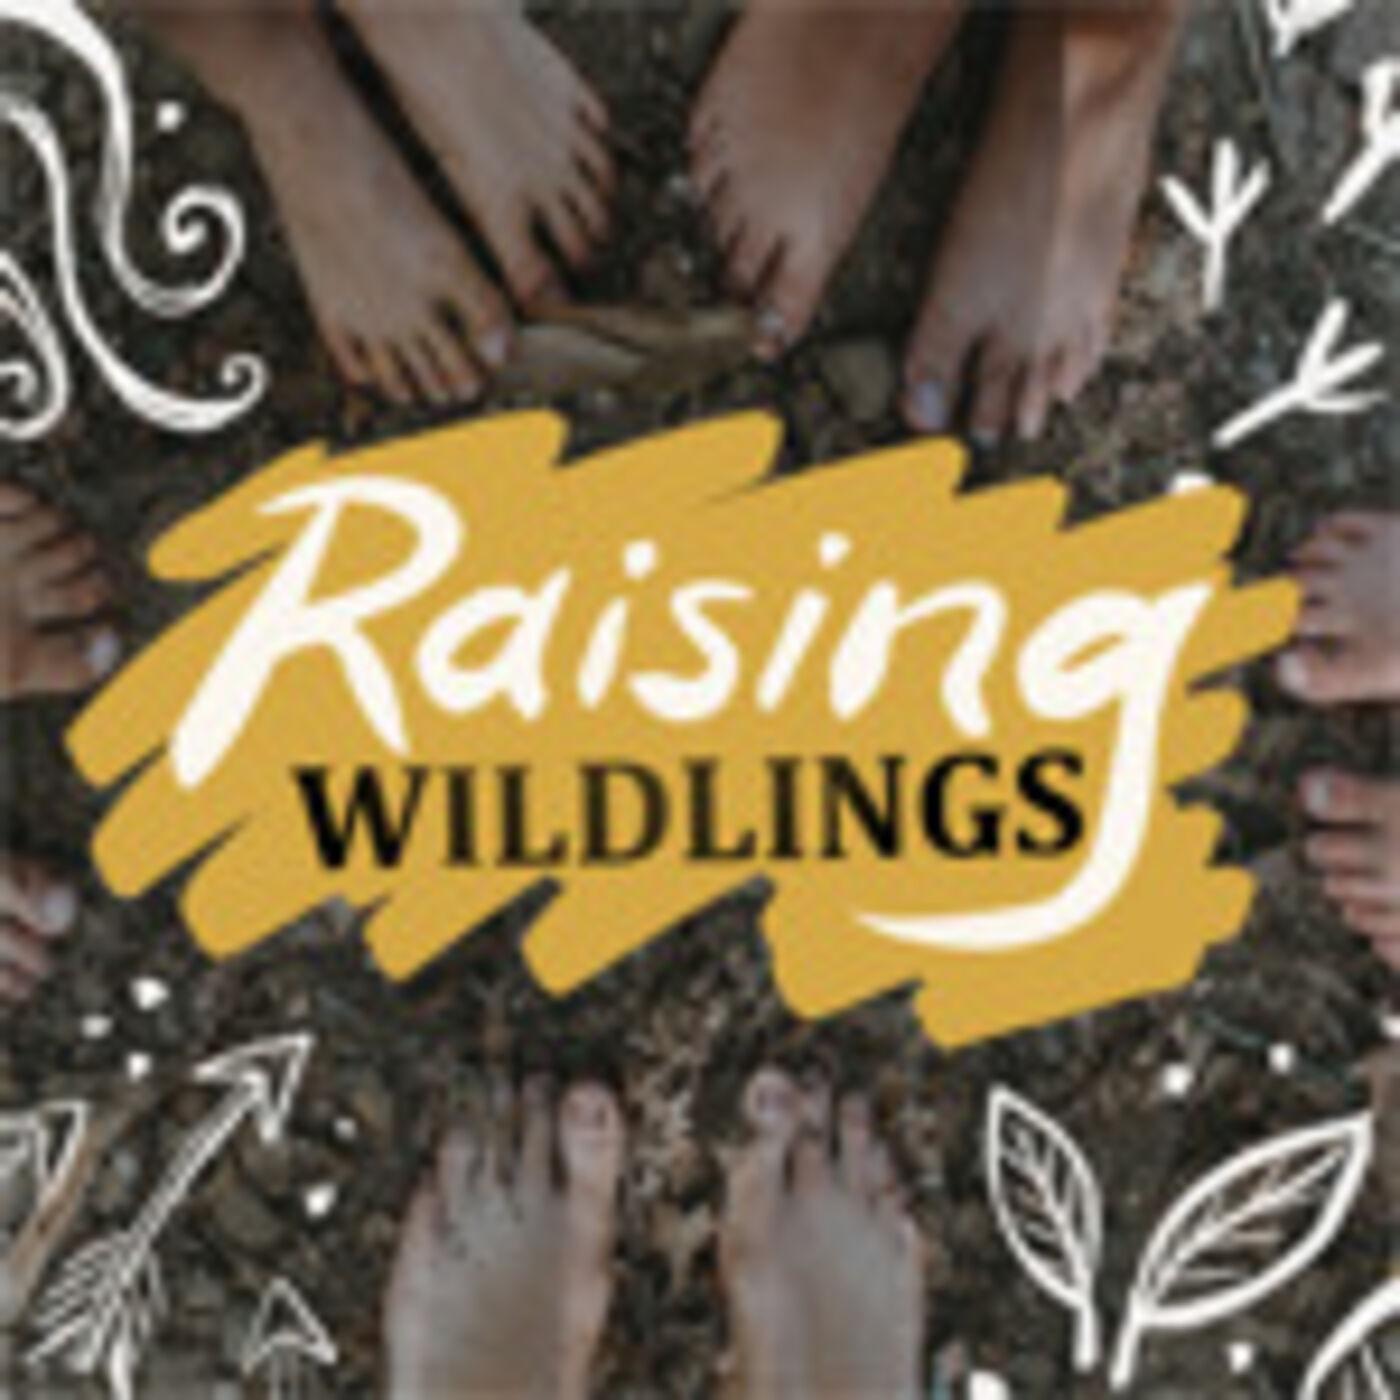 Raising Wildlings podcast show image